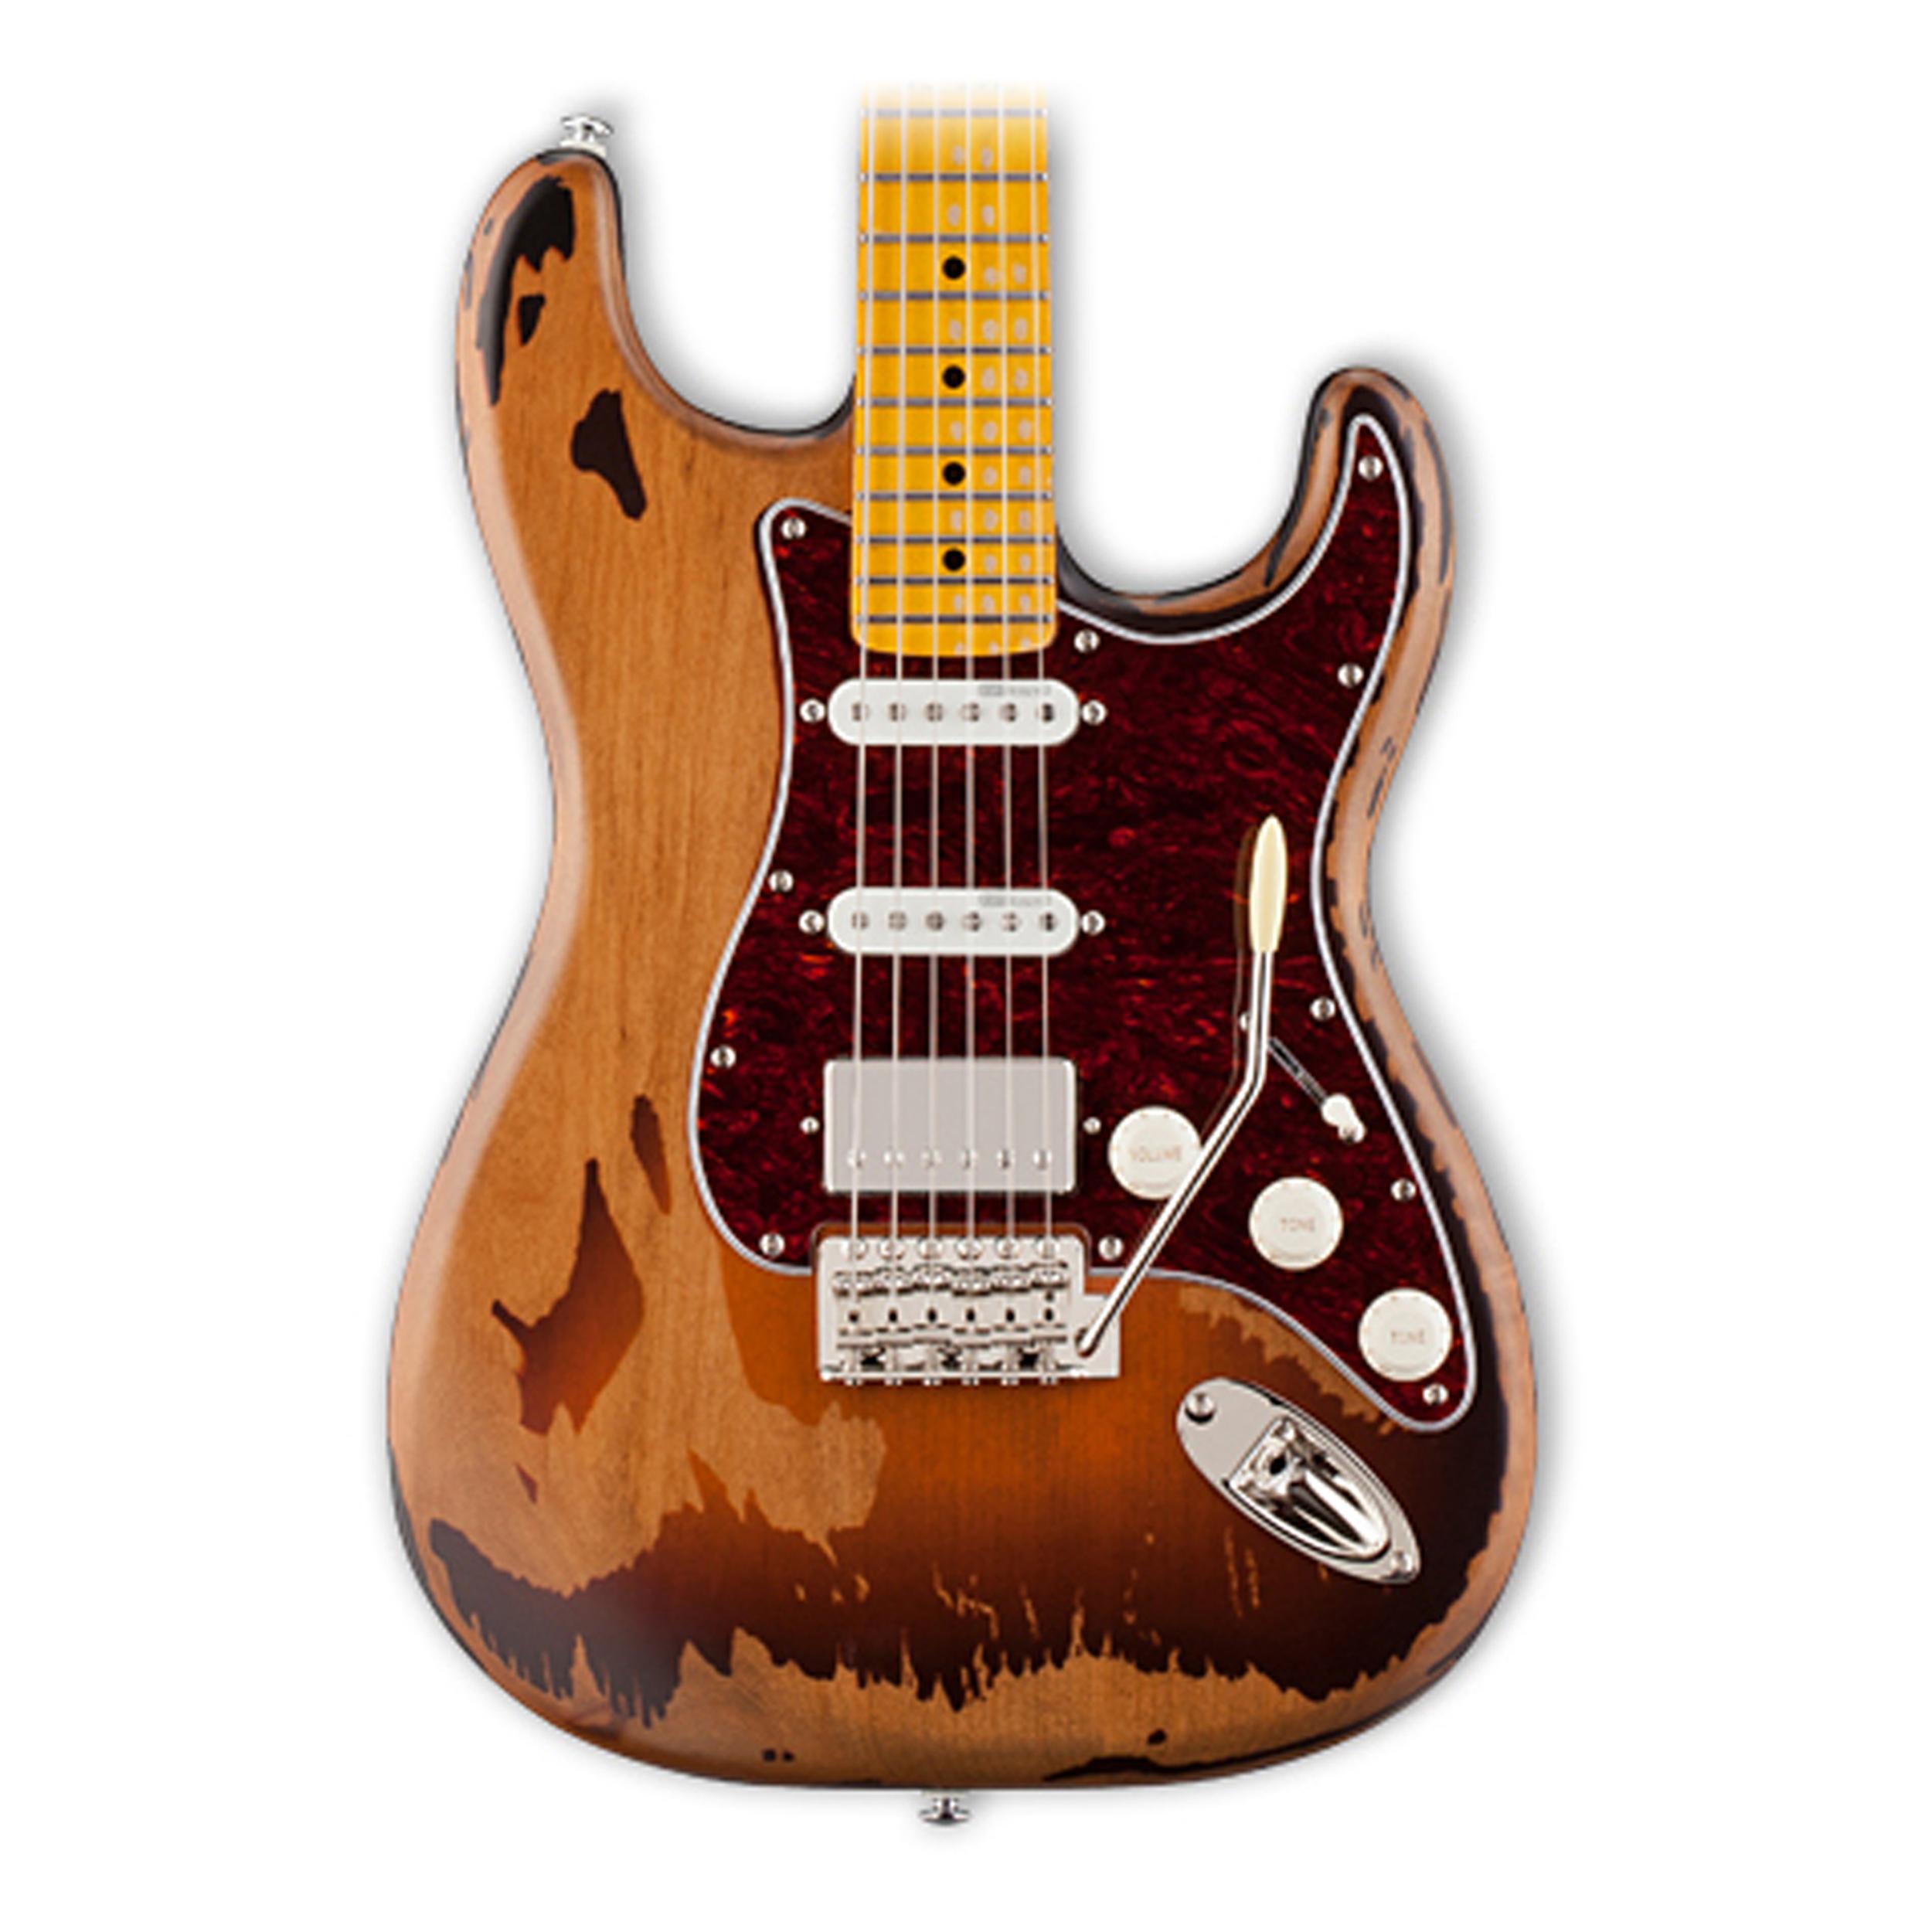 Esp Ltd Gl256 George Lynch Signature Distressed Guitar I